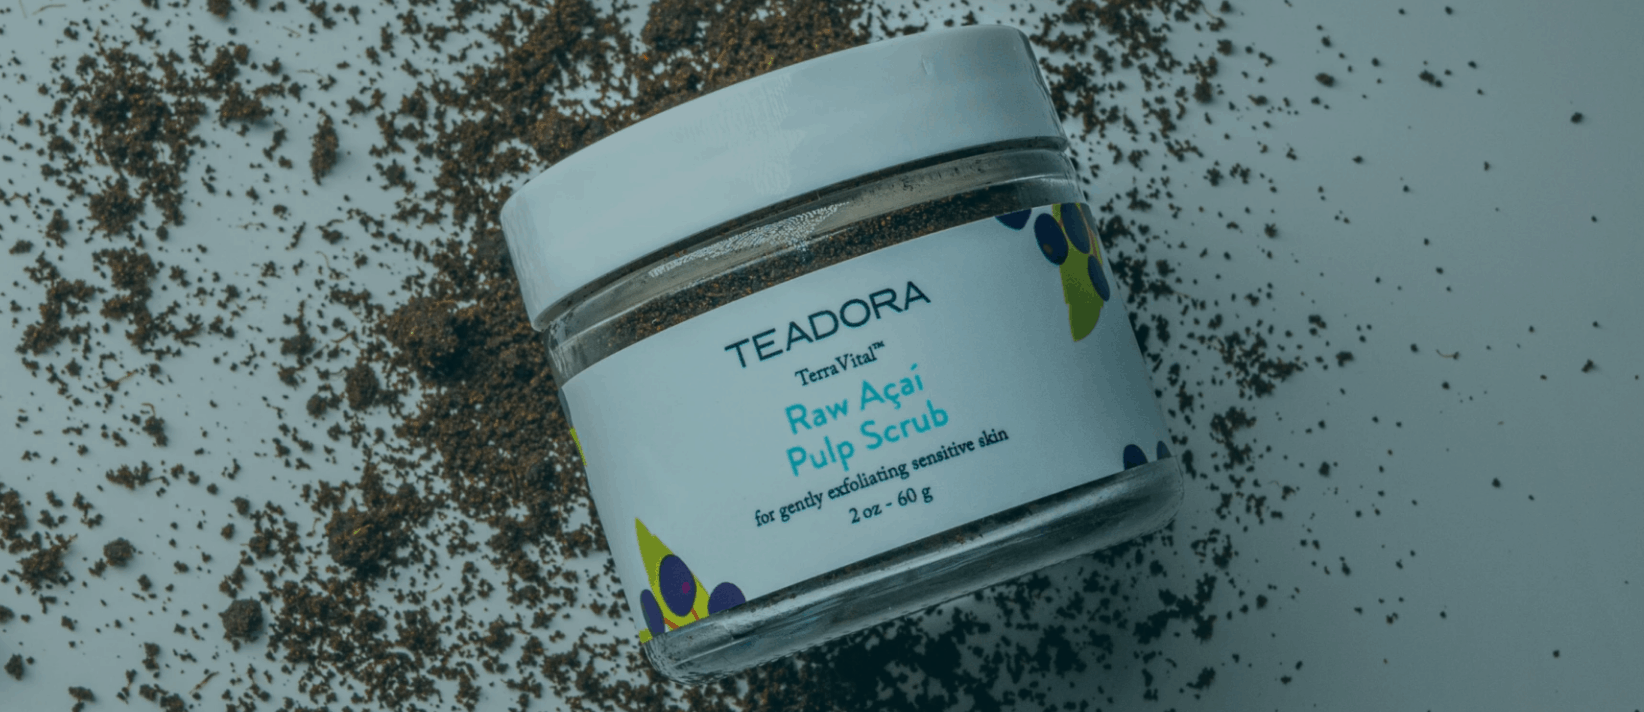 ACAI Facial Scrub By TEADORA CBD